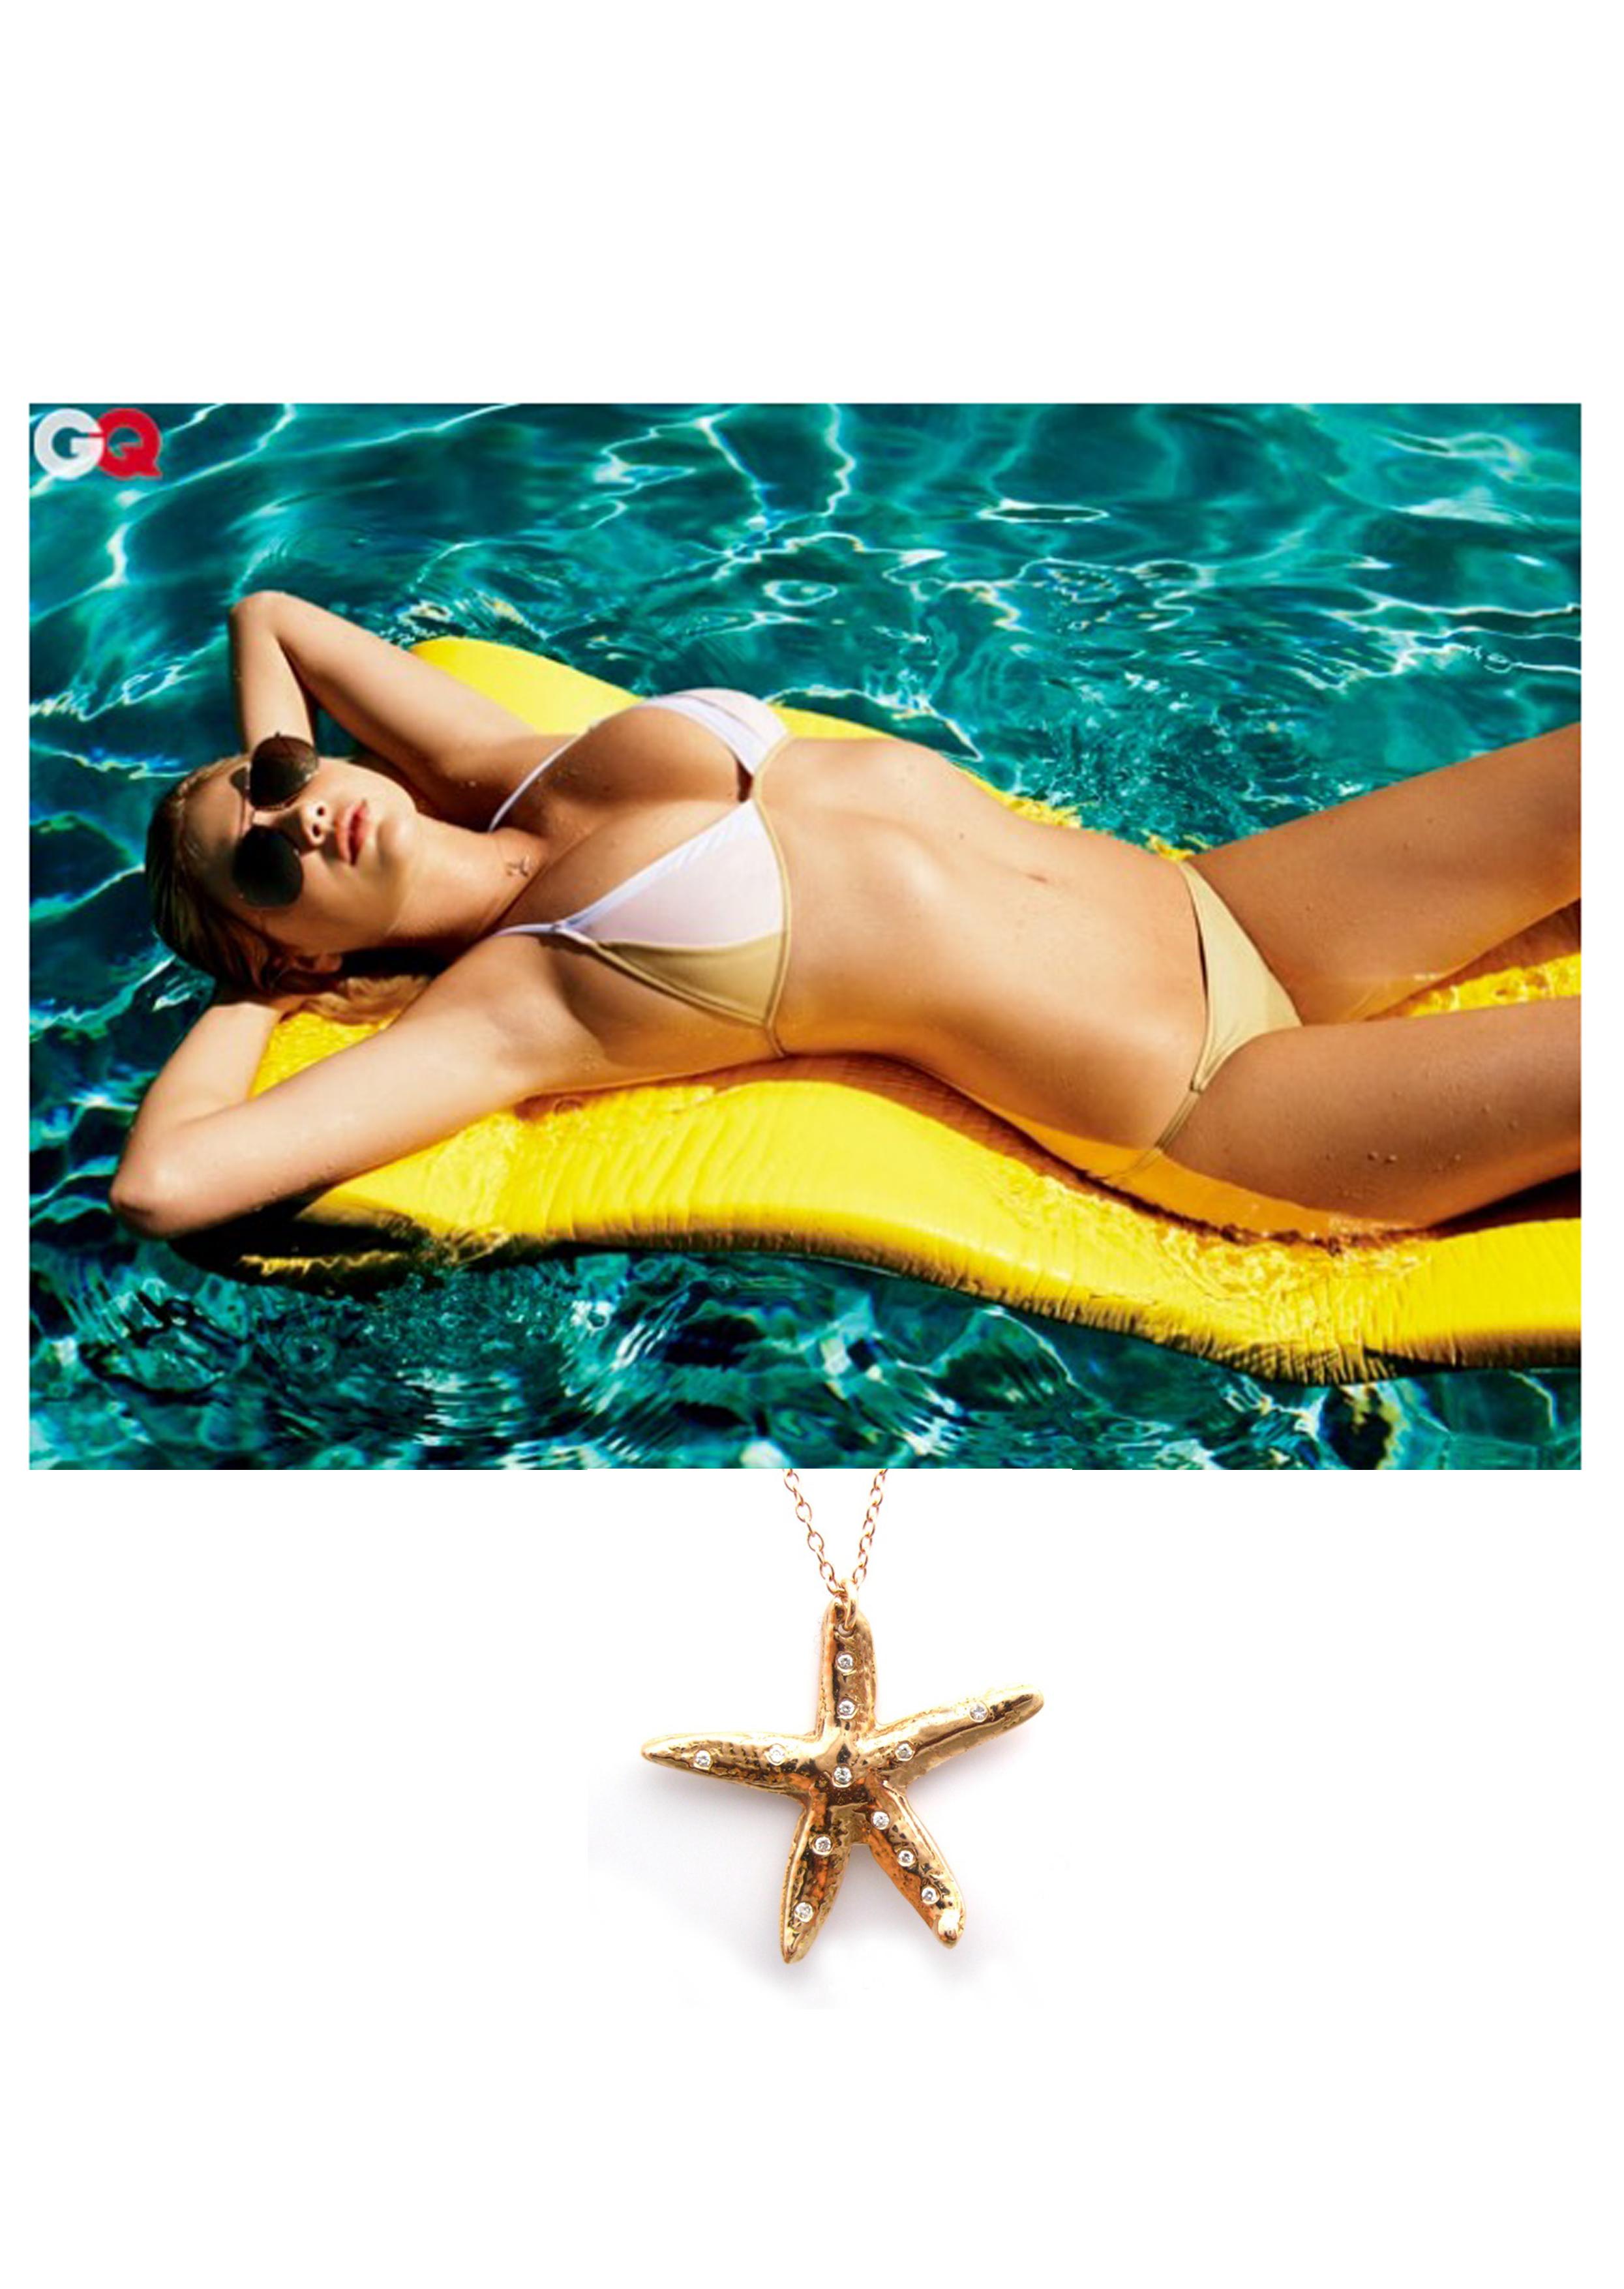 Kate Upton starfish 2.jpg